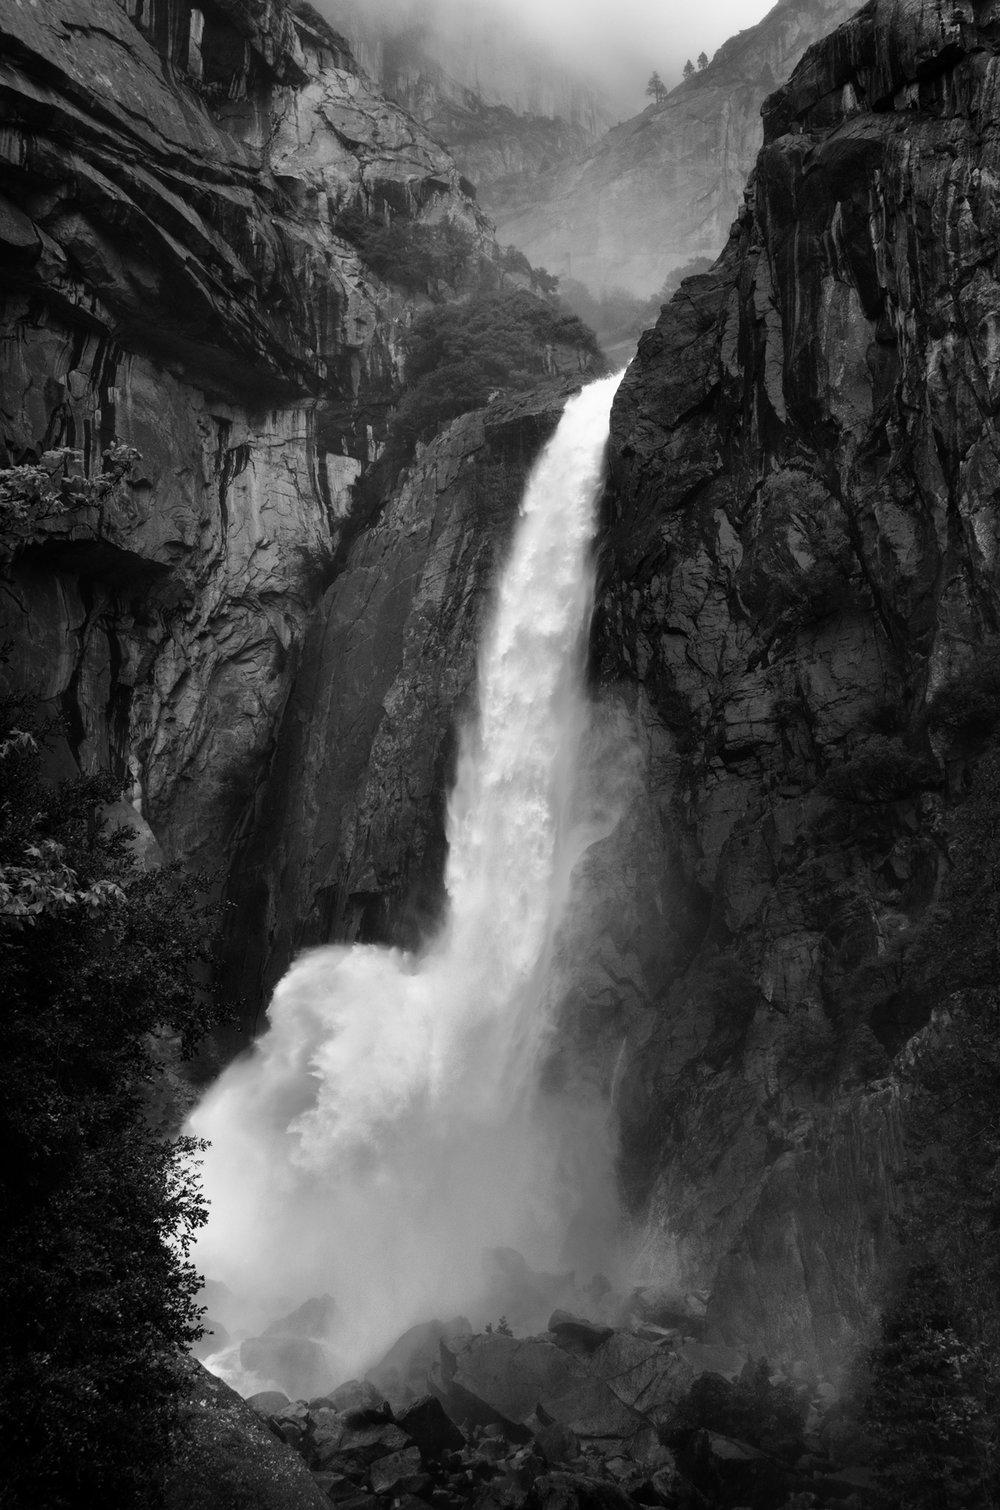 CA_YosemiteFalls_DSC_0453_v4_0406_300dpi.jpg